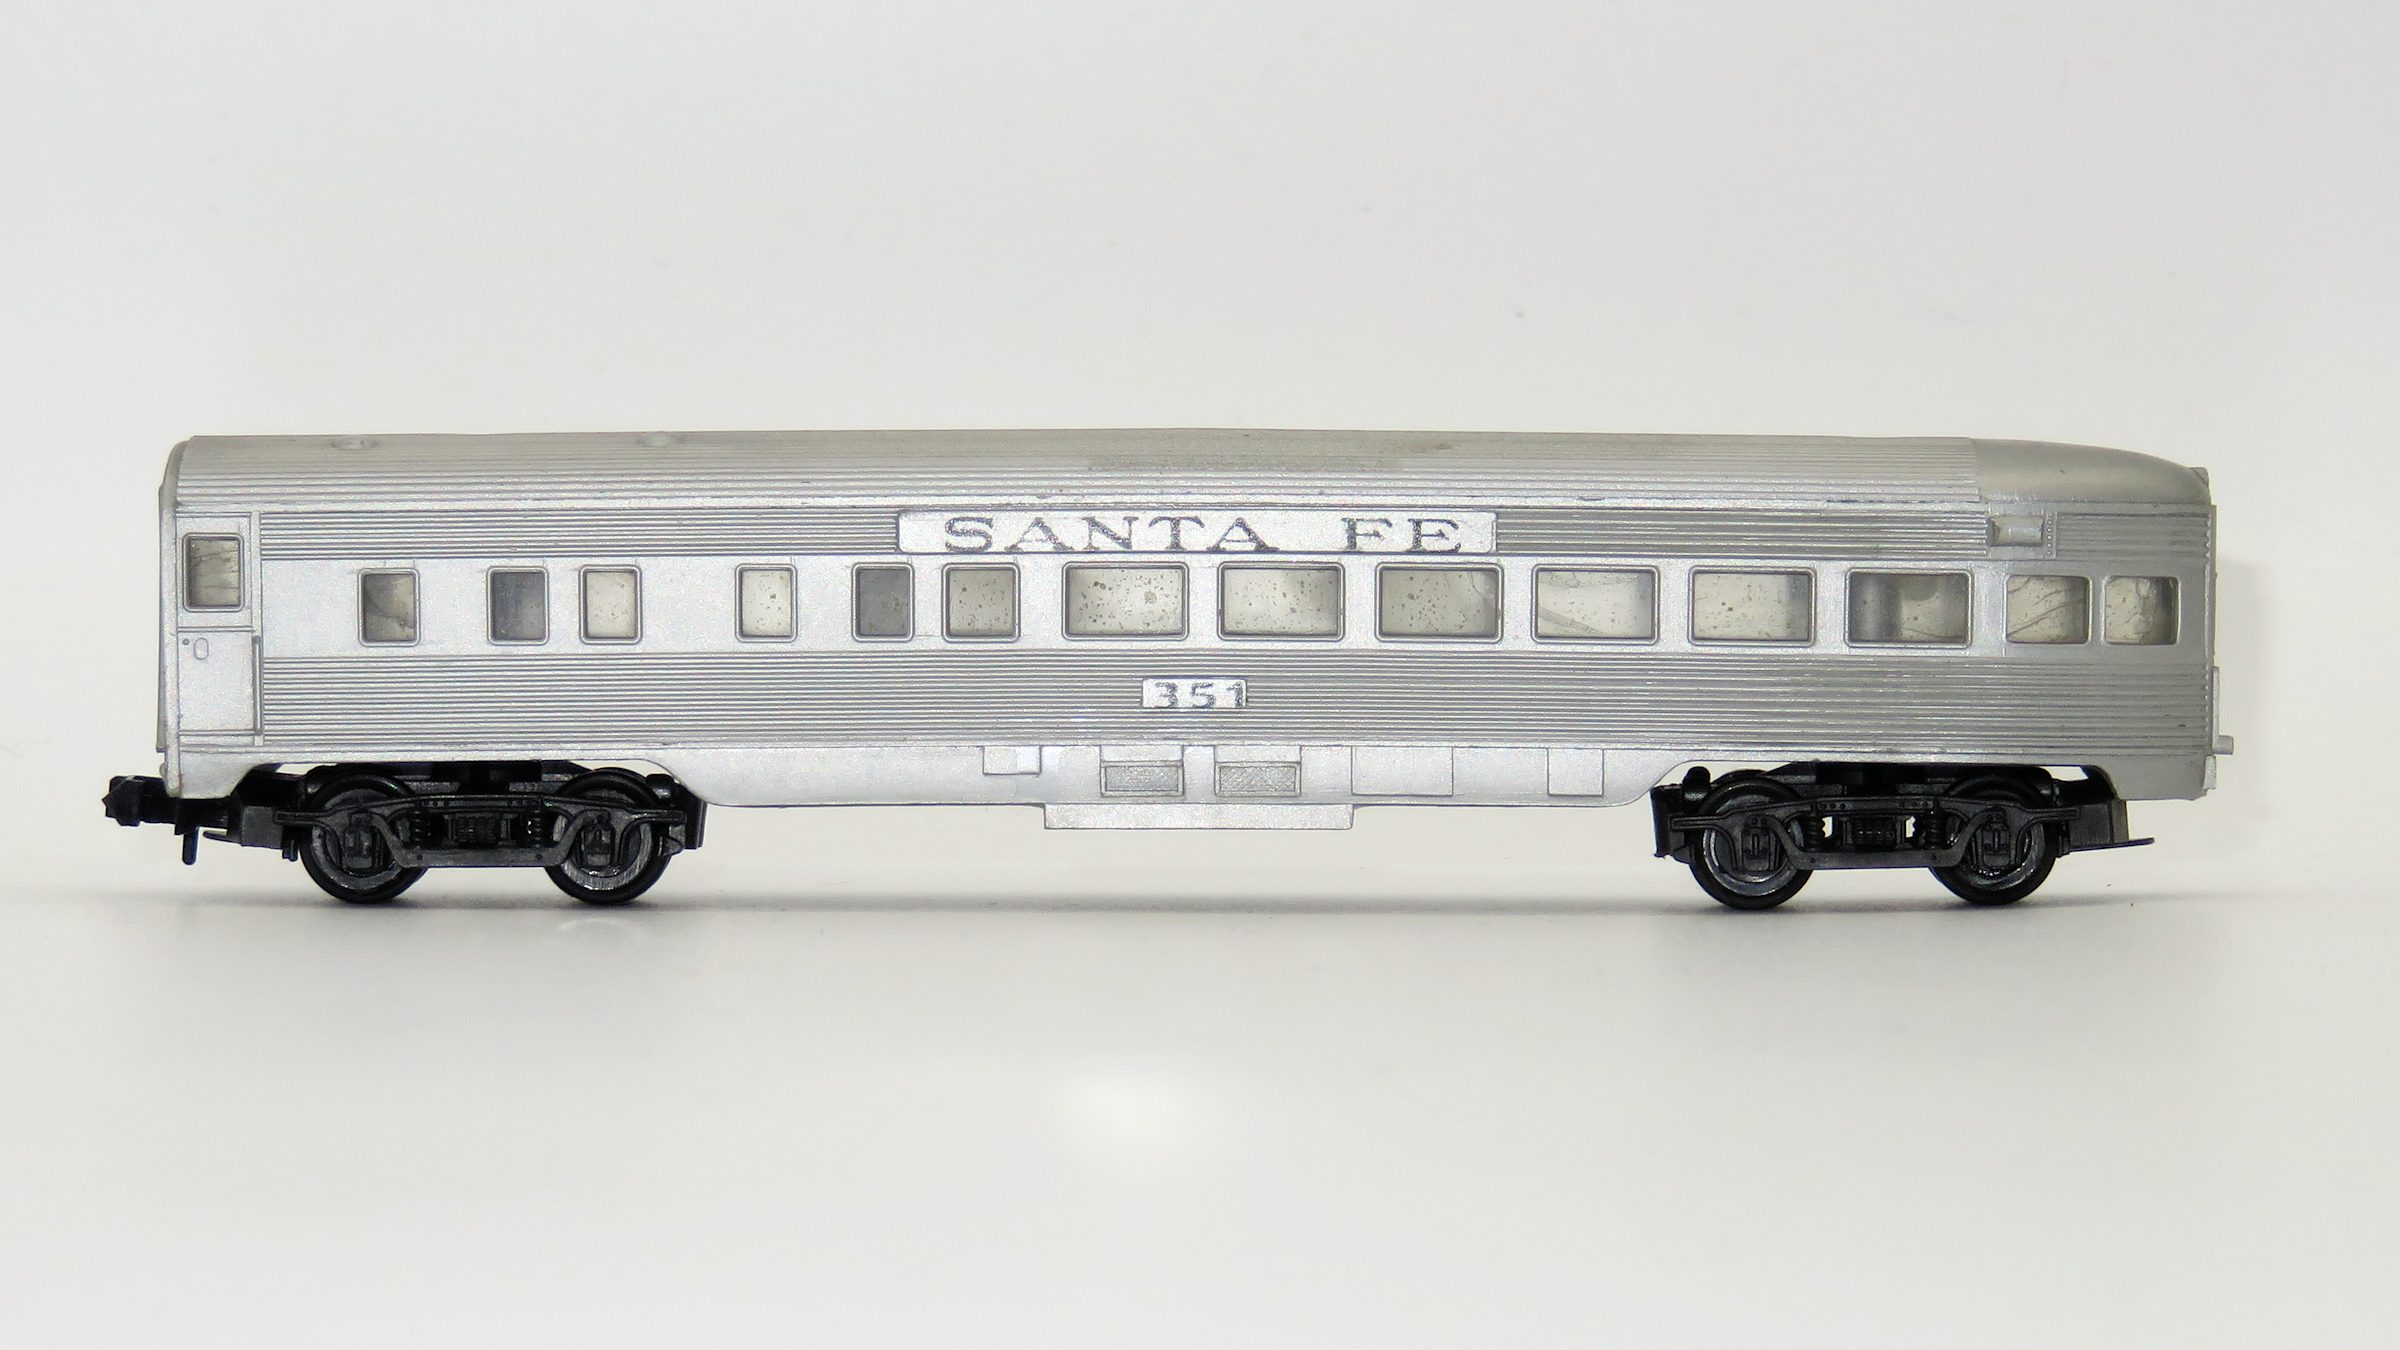 N Scale - Arnold - 0355S - Passenger Car, Lightweight, Corrugated - Santa Fe - 351